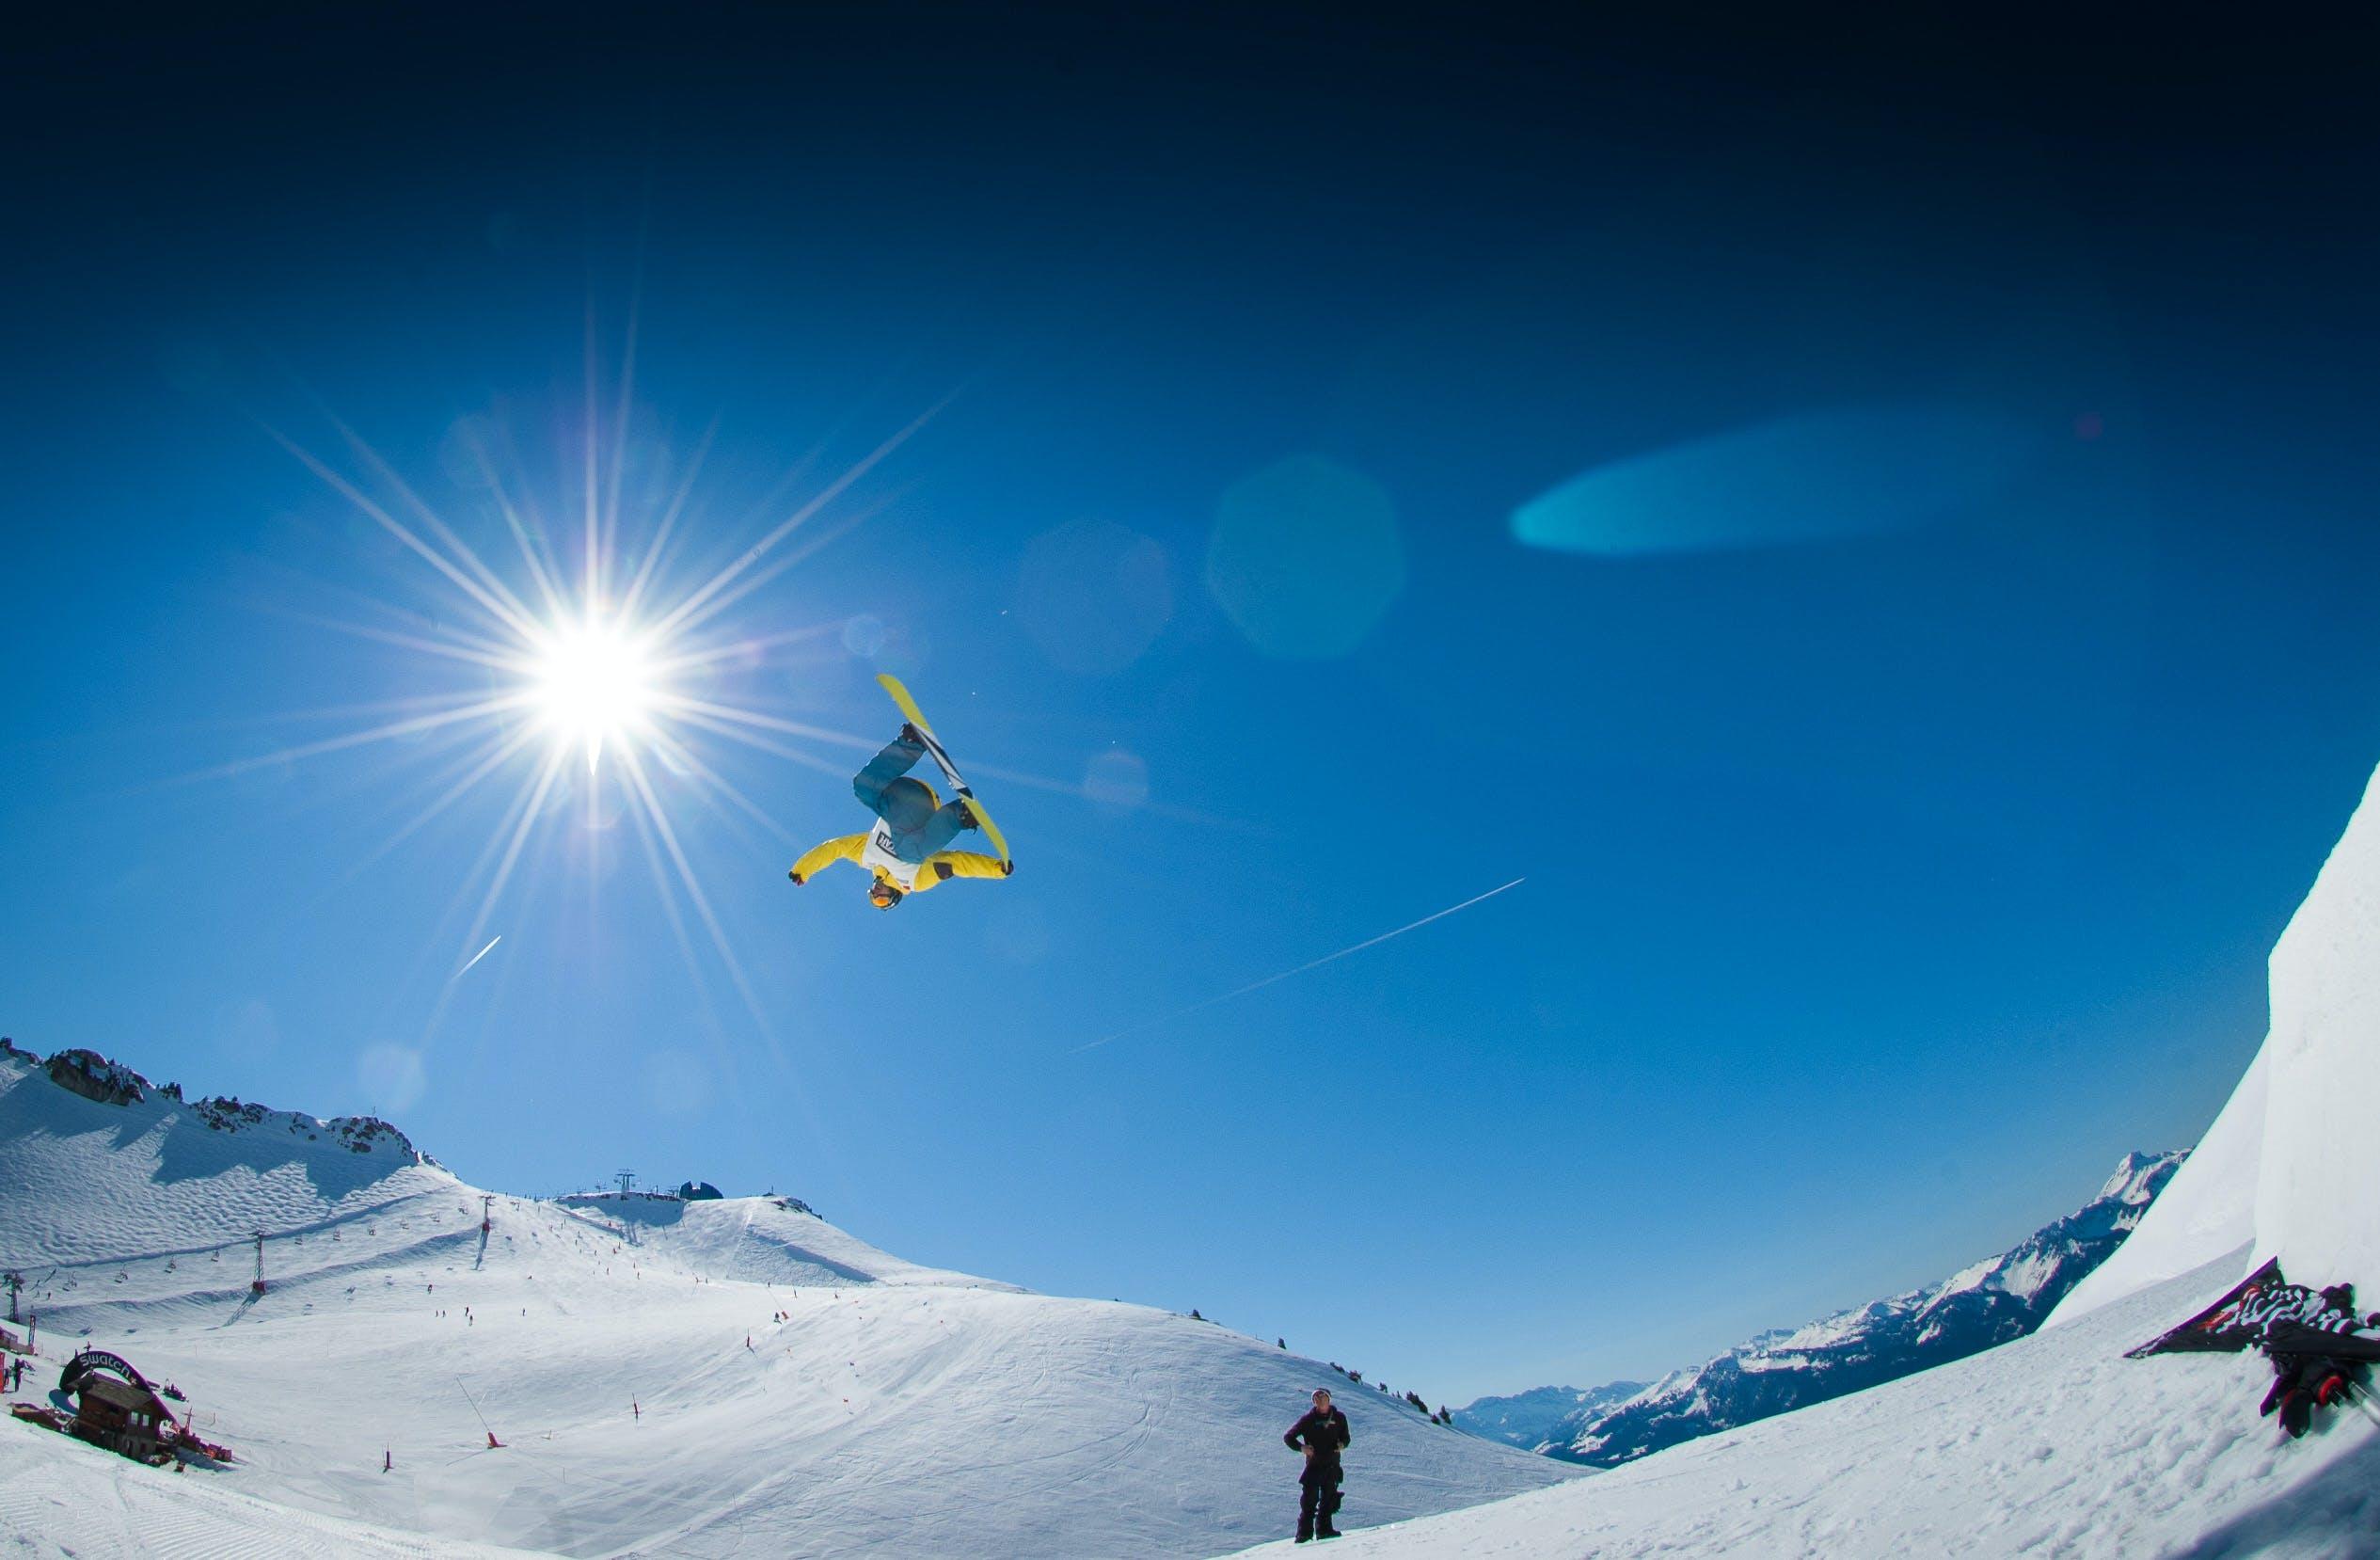 Man Performing Snowboard Stunts